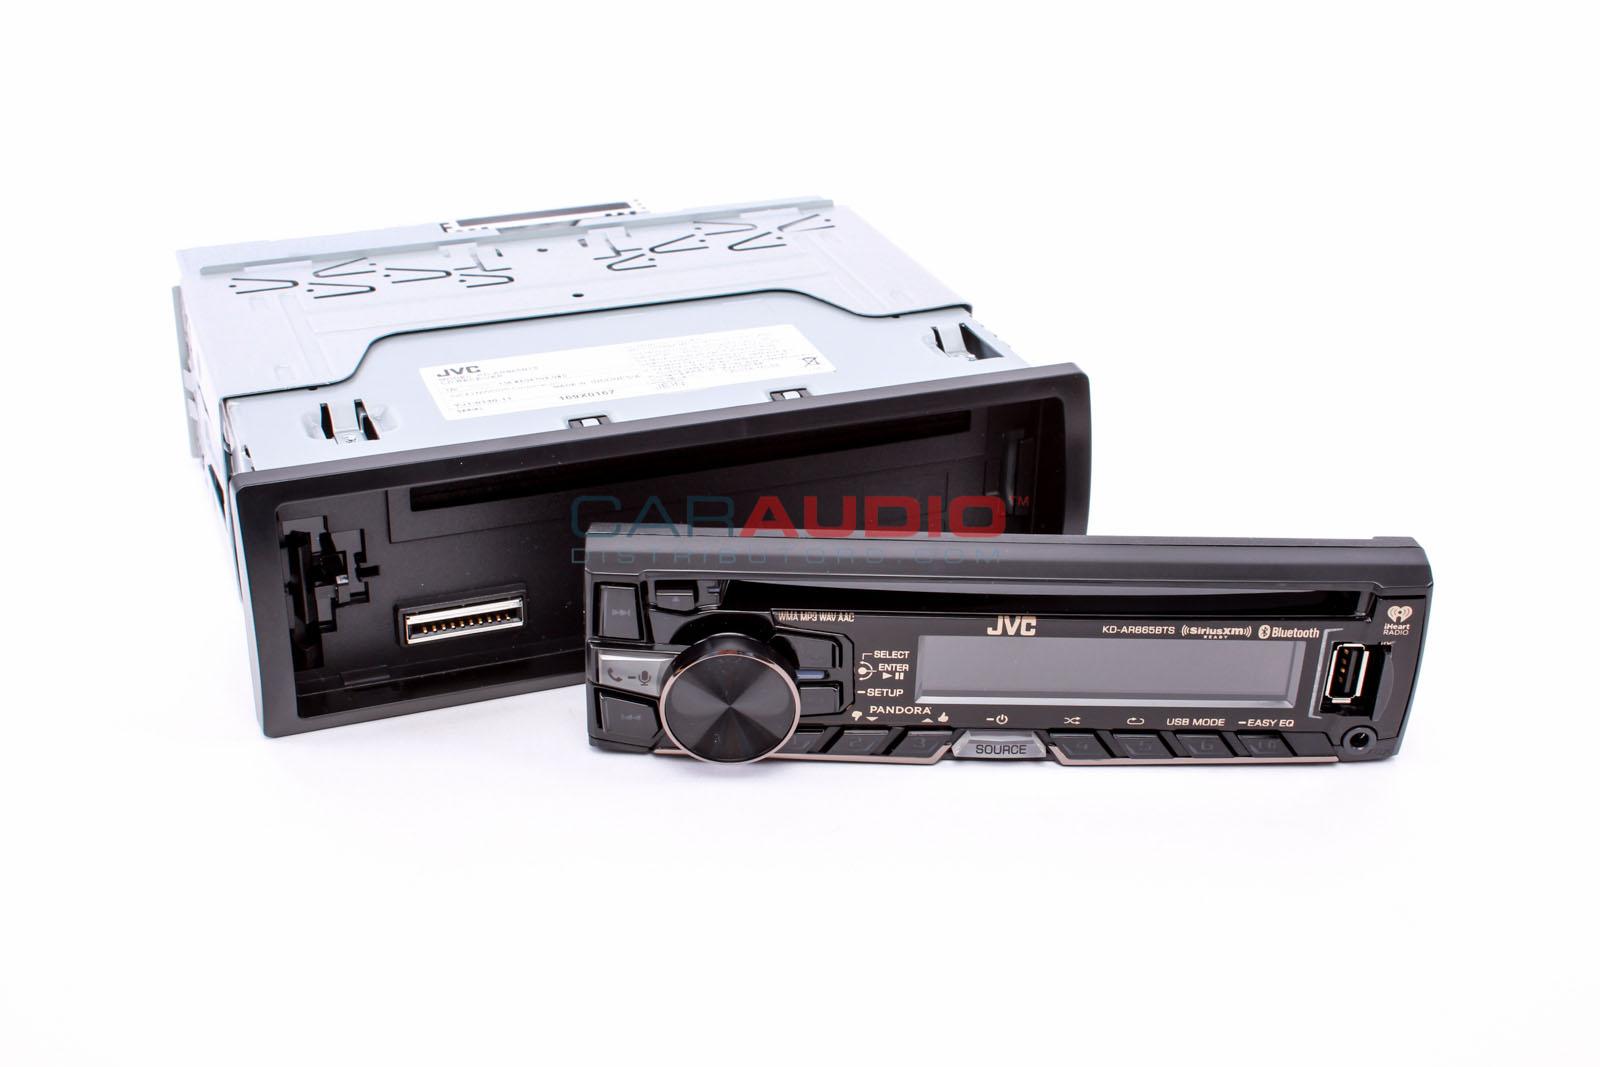 new jvc kd ar865bts in dash single din car stereo cd mp3. Black Bedroom Furniture Sets. Home Design Ideas